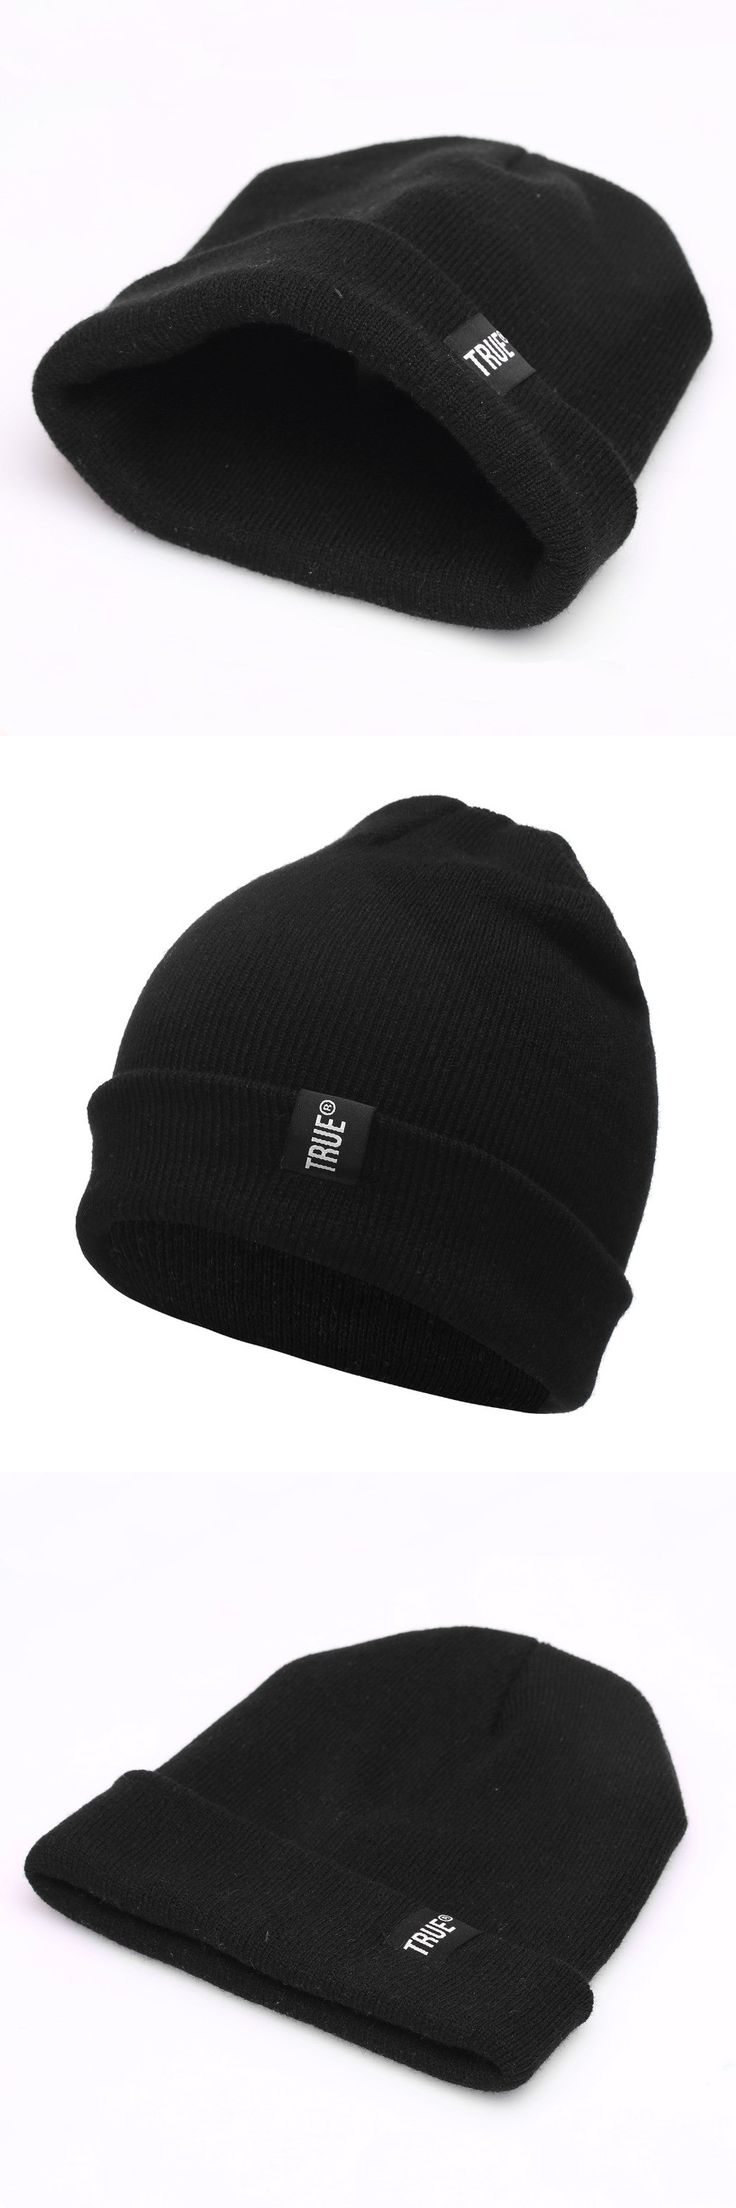 Unisex brand hat men's winter beanie man skullies Knitted beanies women's Winter Hats Hip Hop caps Autumn gorros